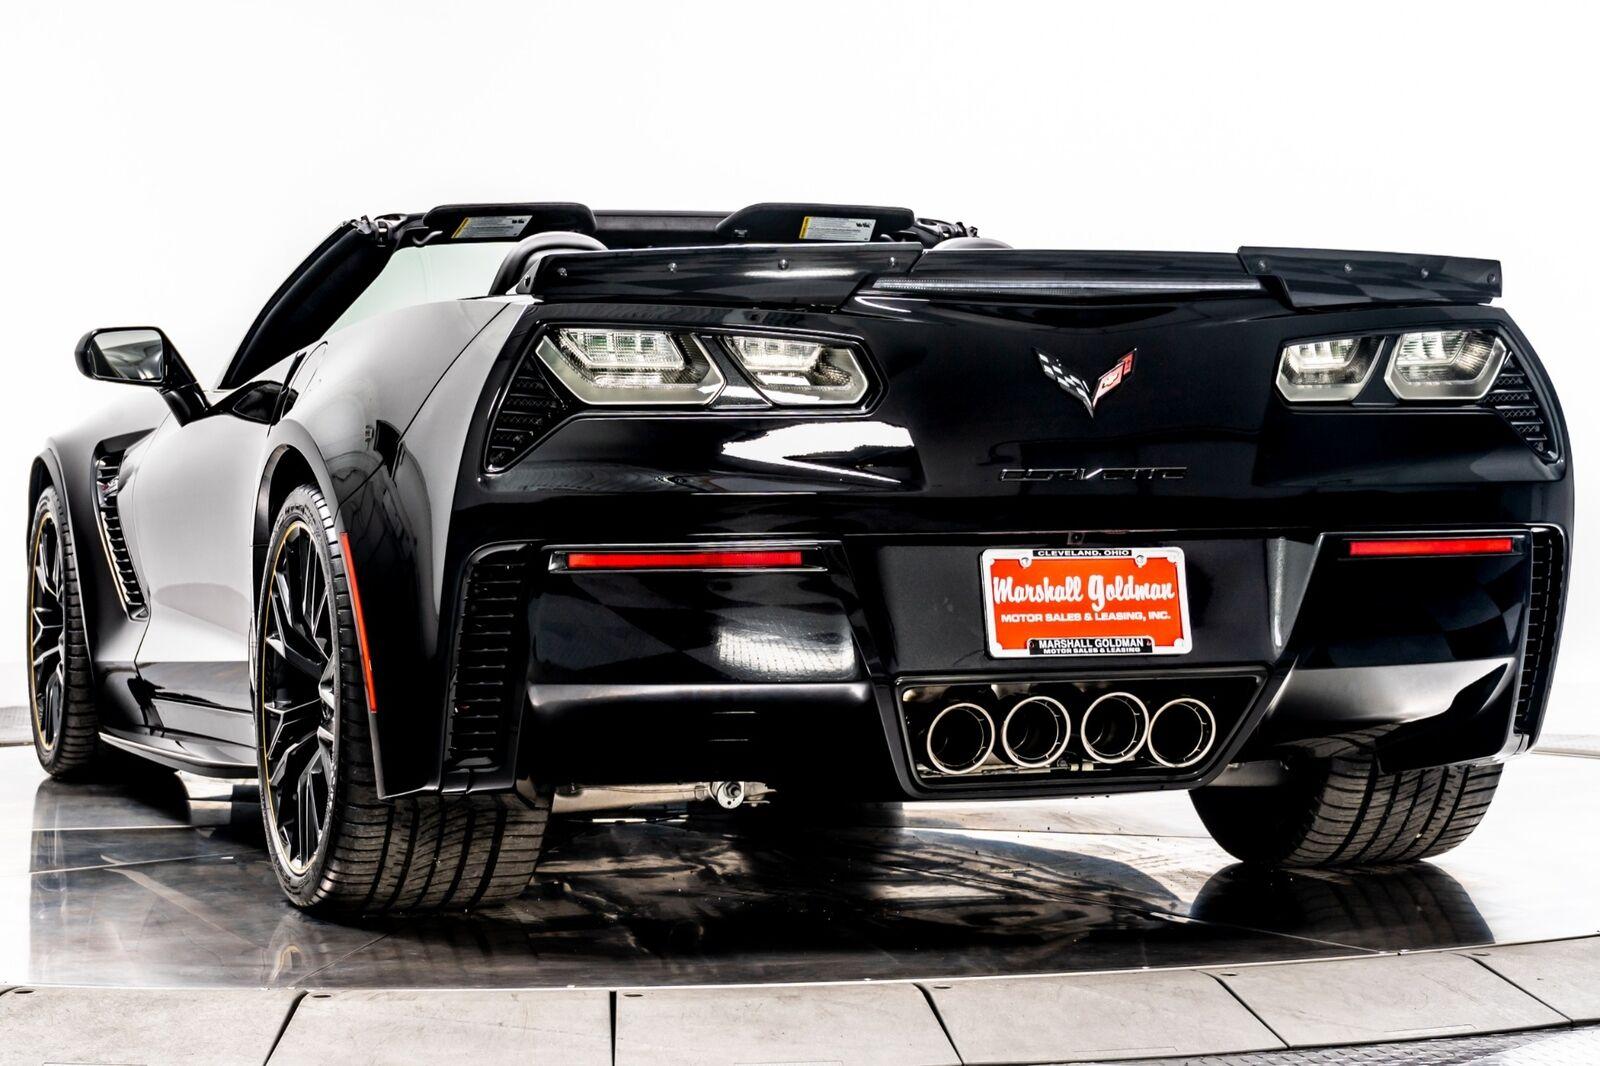 2018 Black Chevrolet Corvette Z06 3LZ   C7 Corvette Photo 6